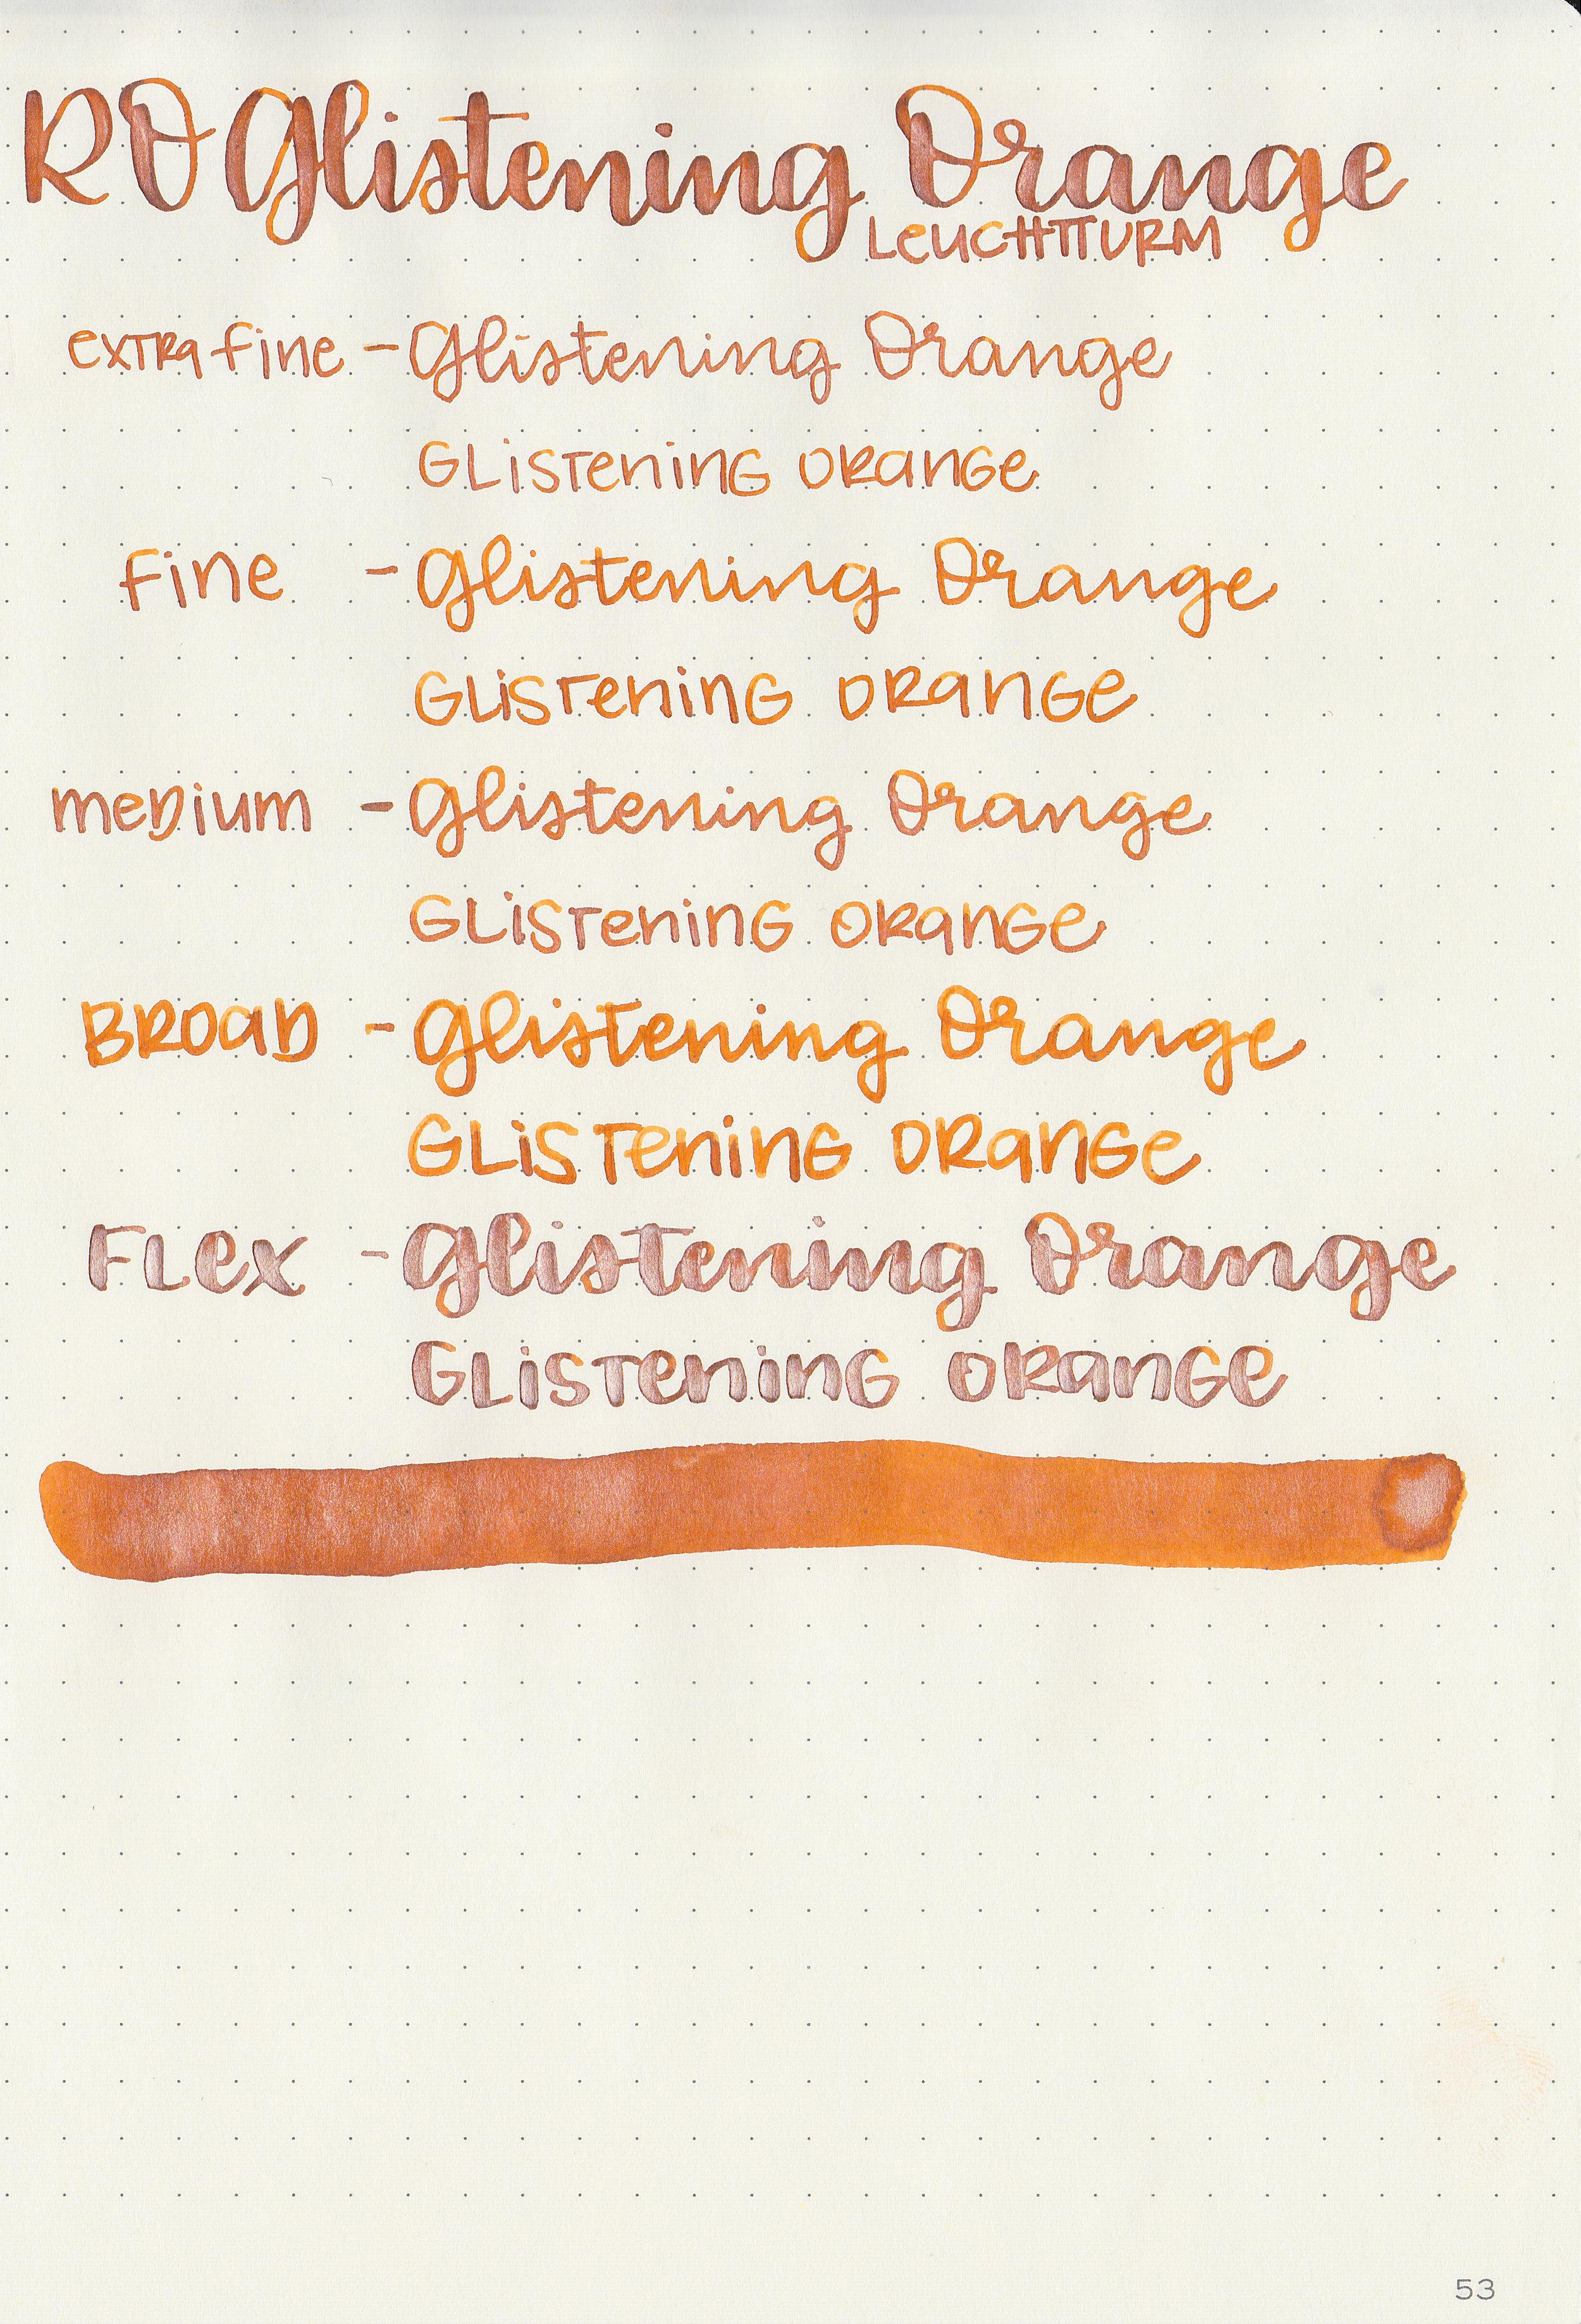 ro-glistening-orange-rumble-8.jpg